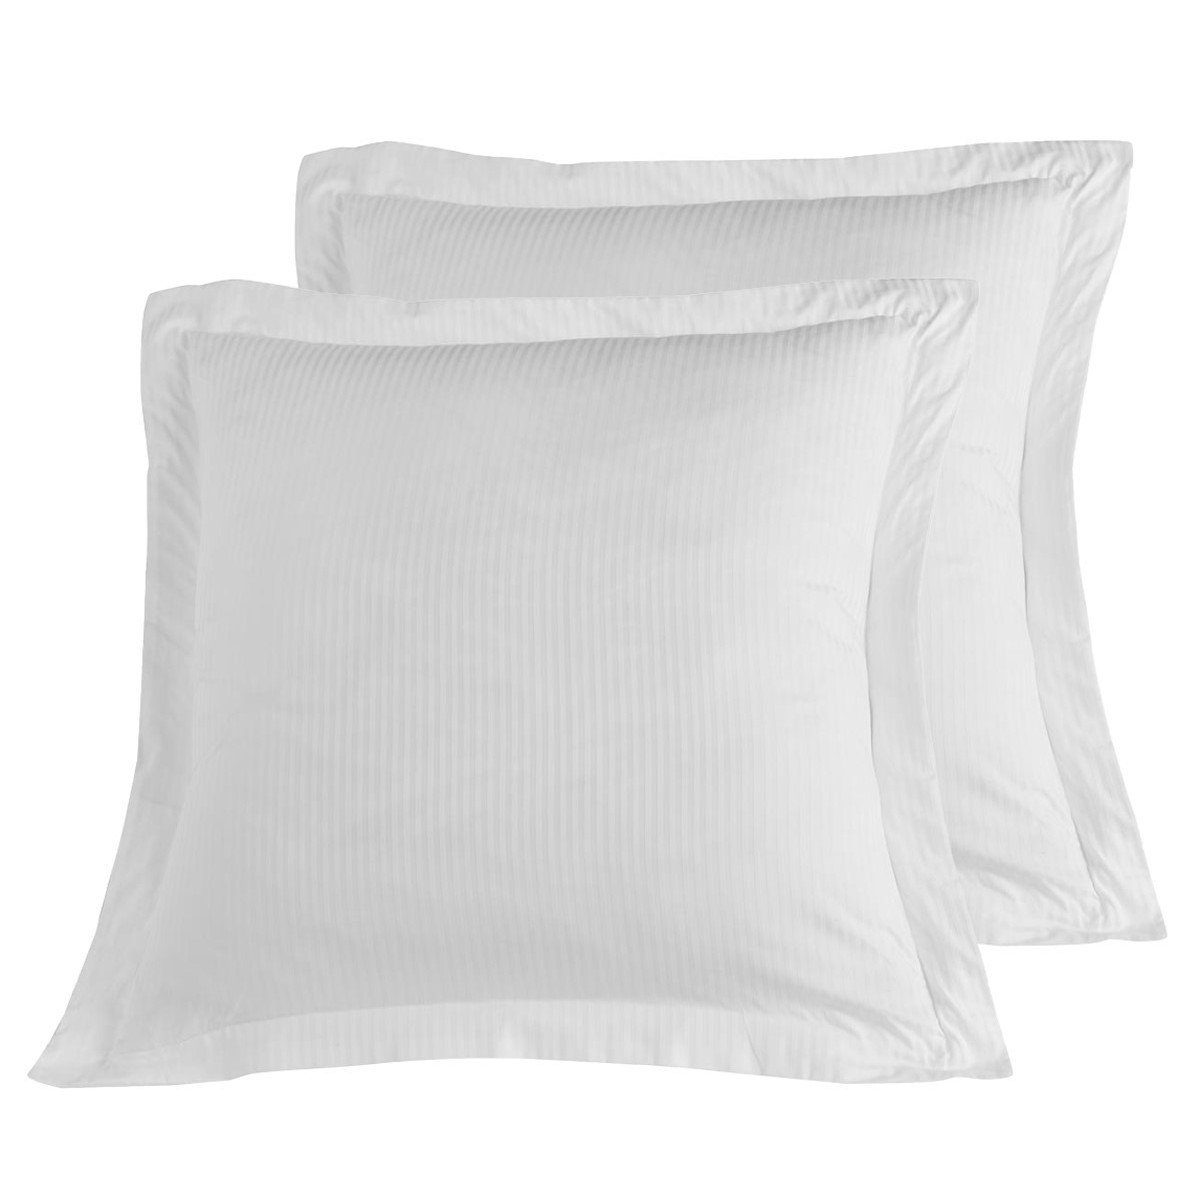 2 taies d'oreiller rayées satin coton Blanc 65x65 cm